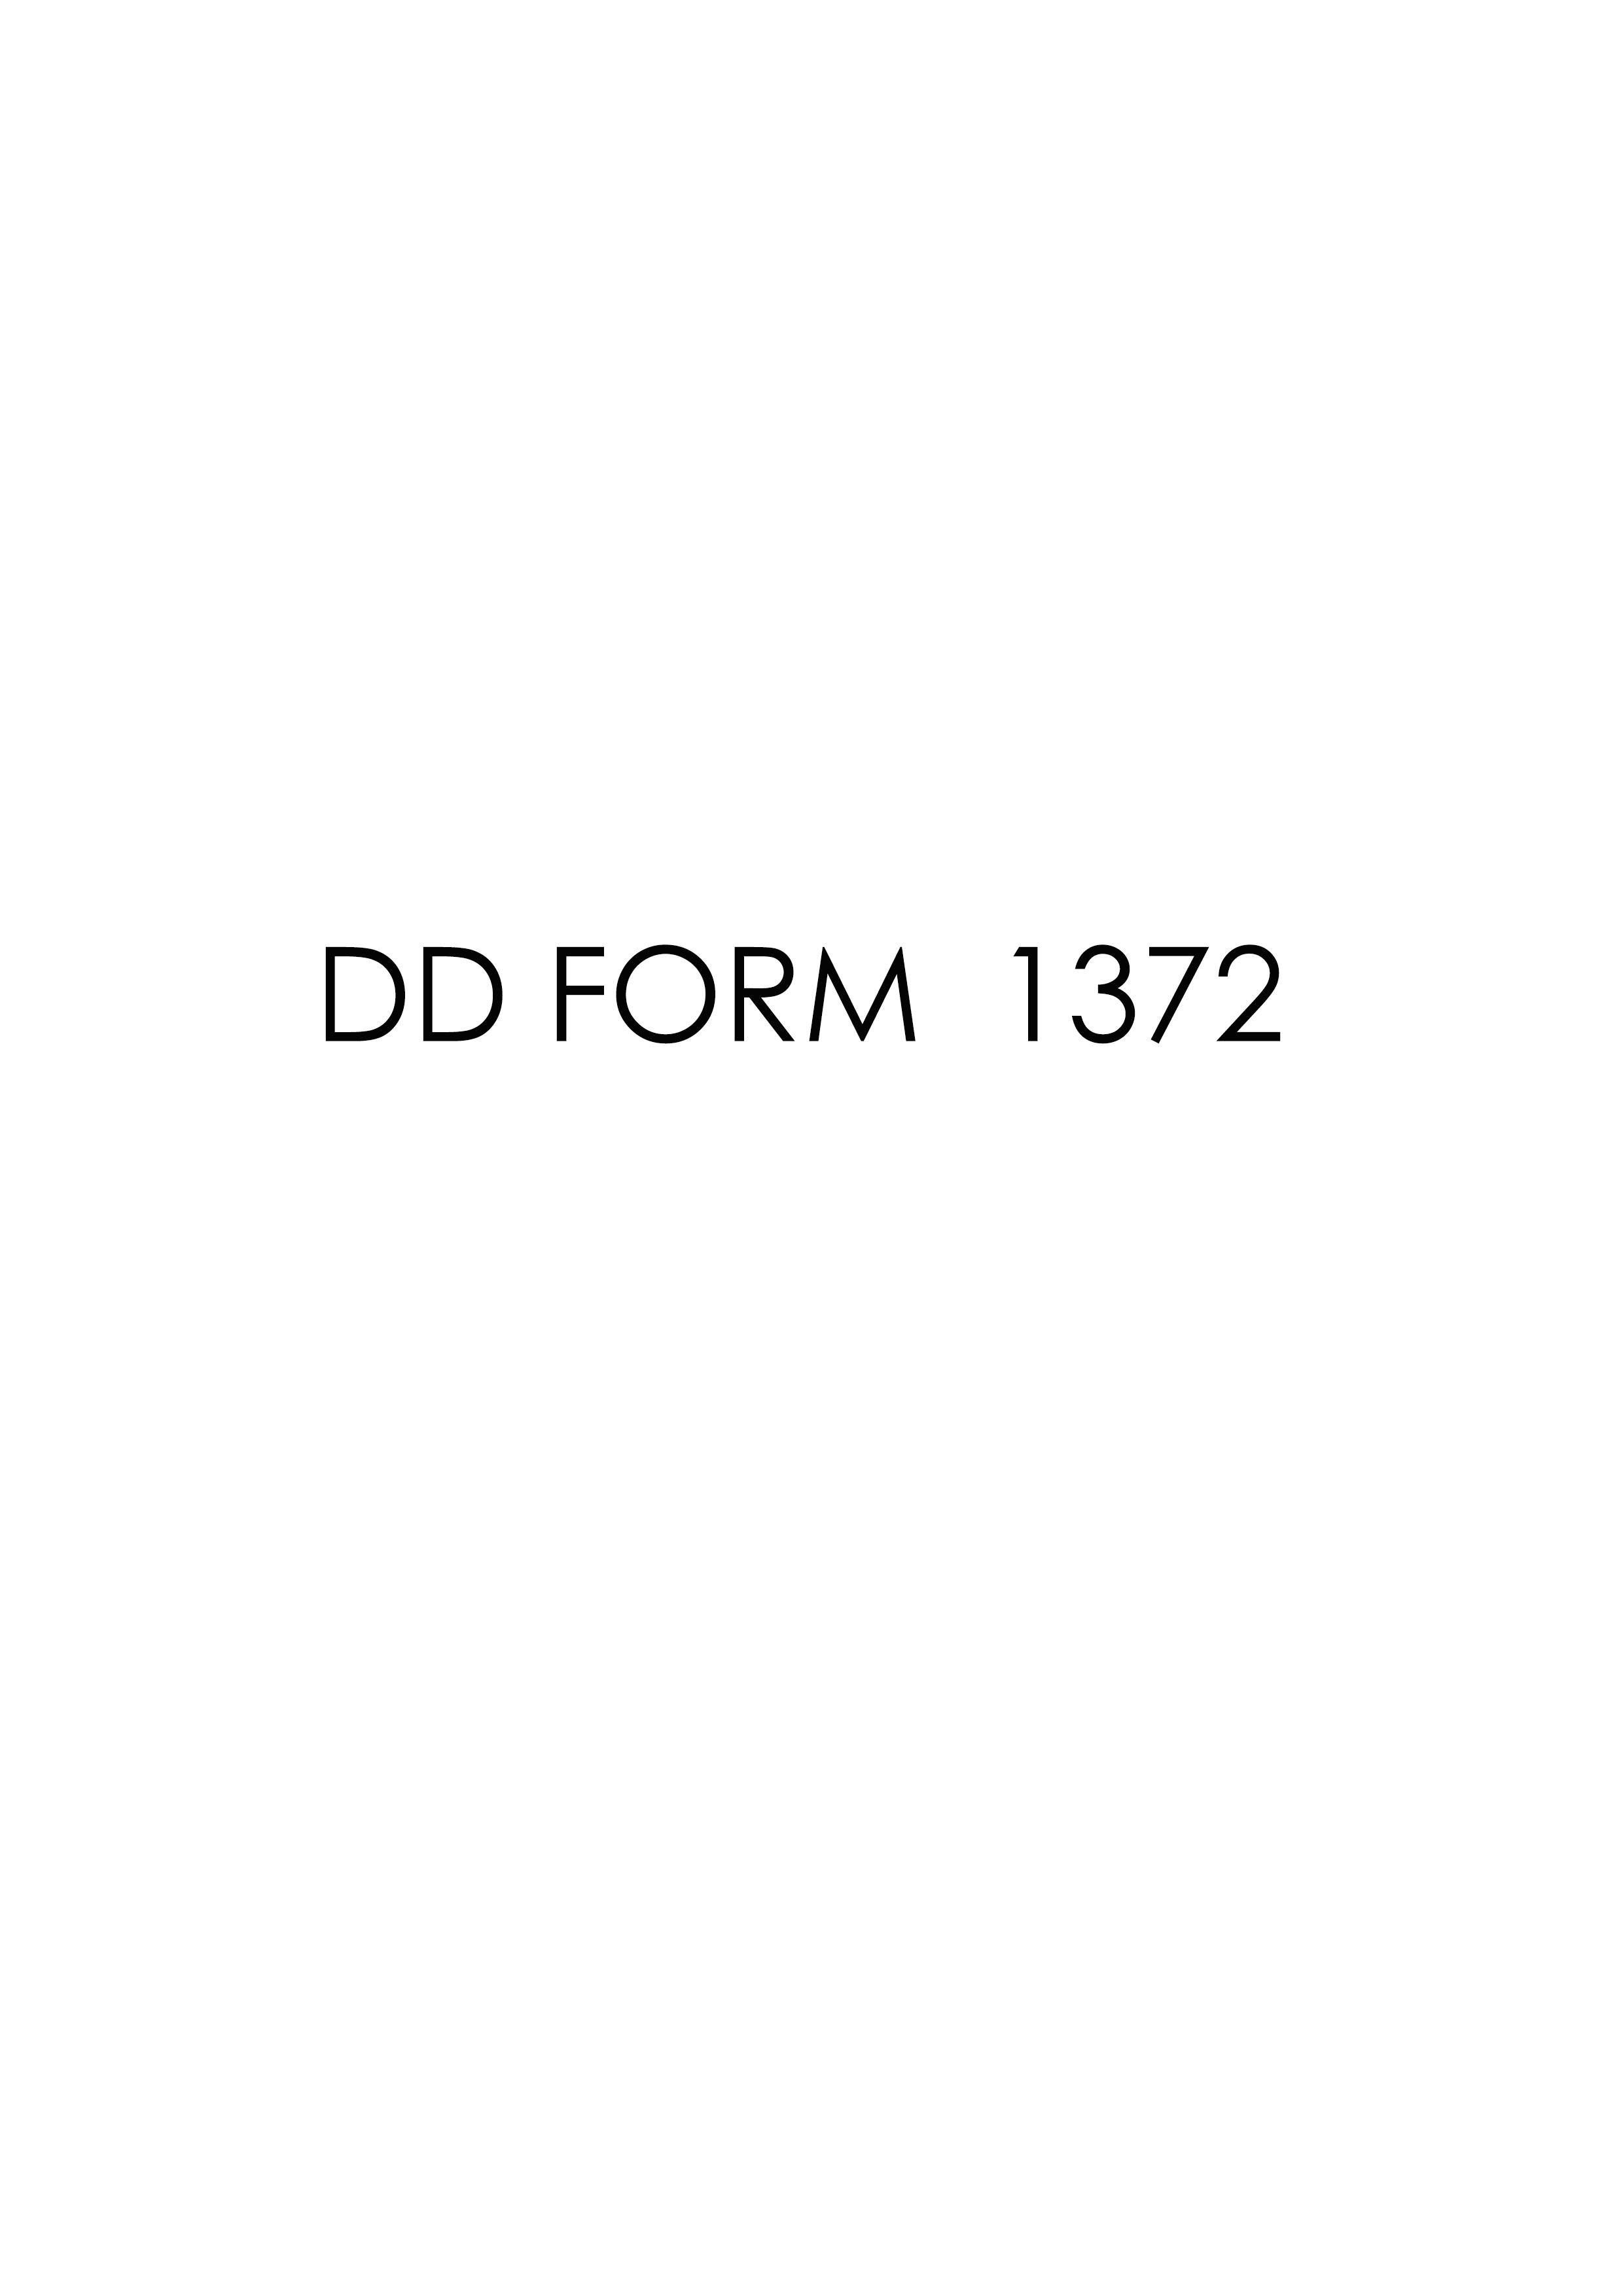 Download dd Form 1372 Free